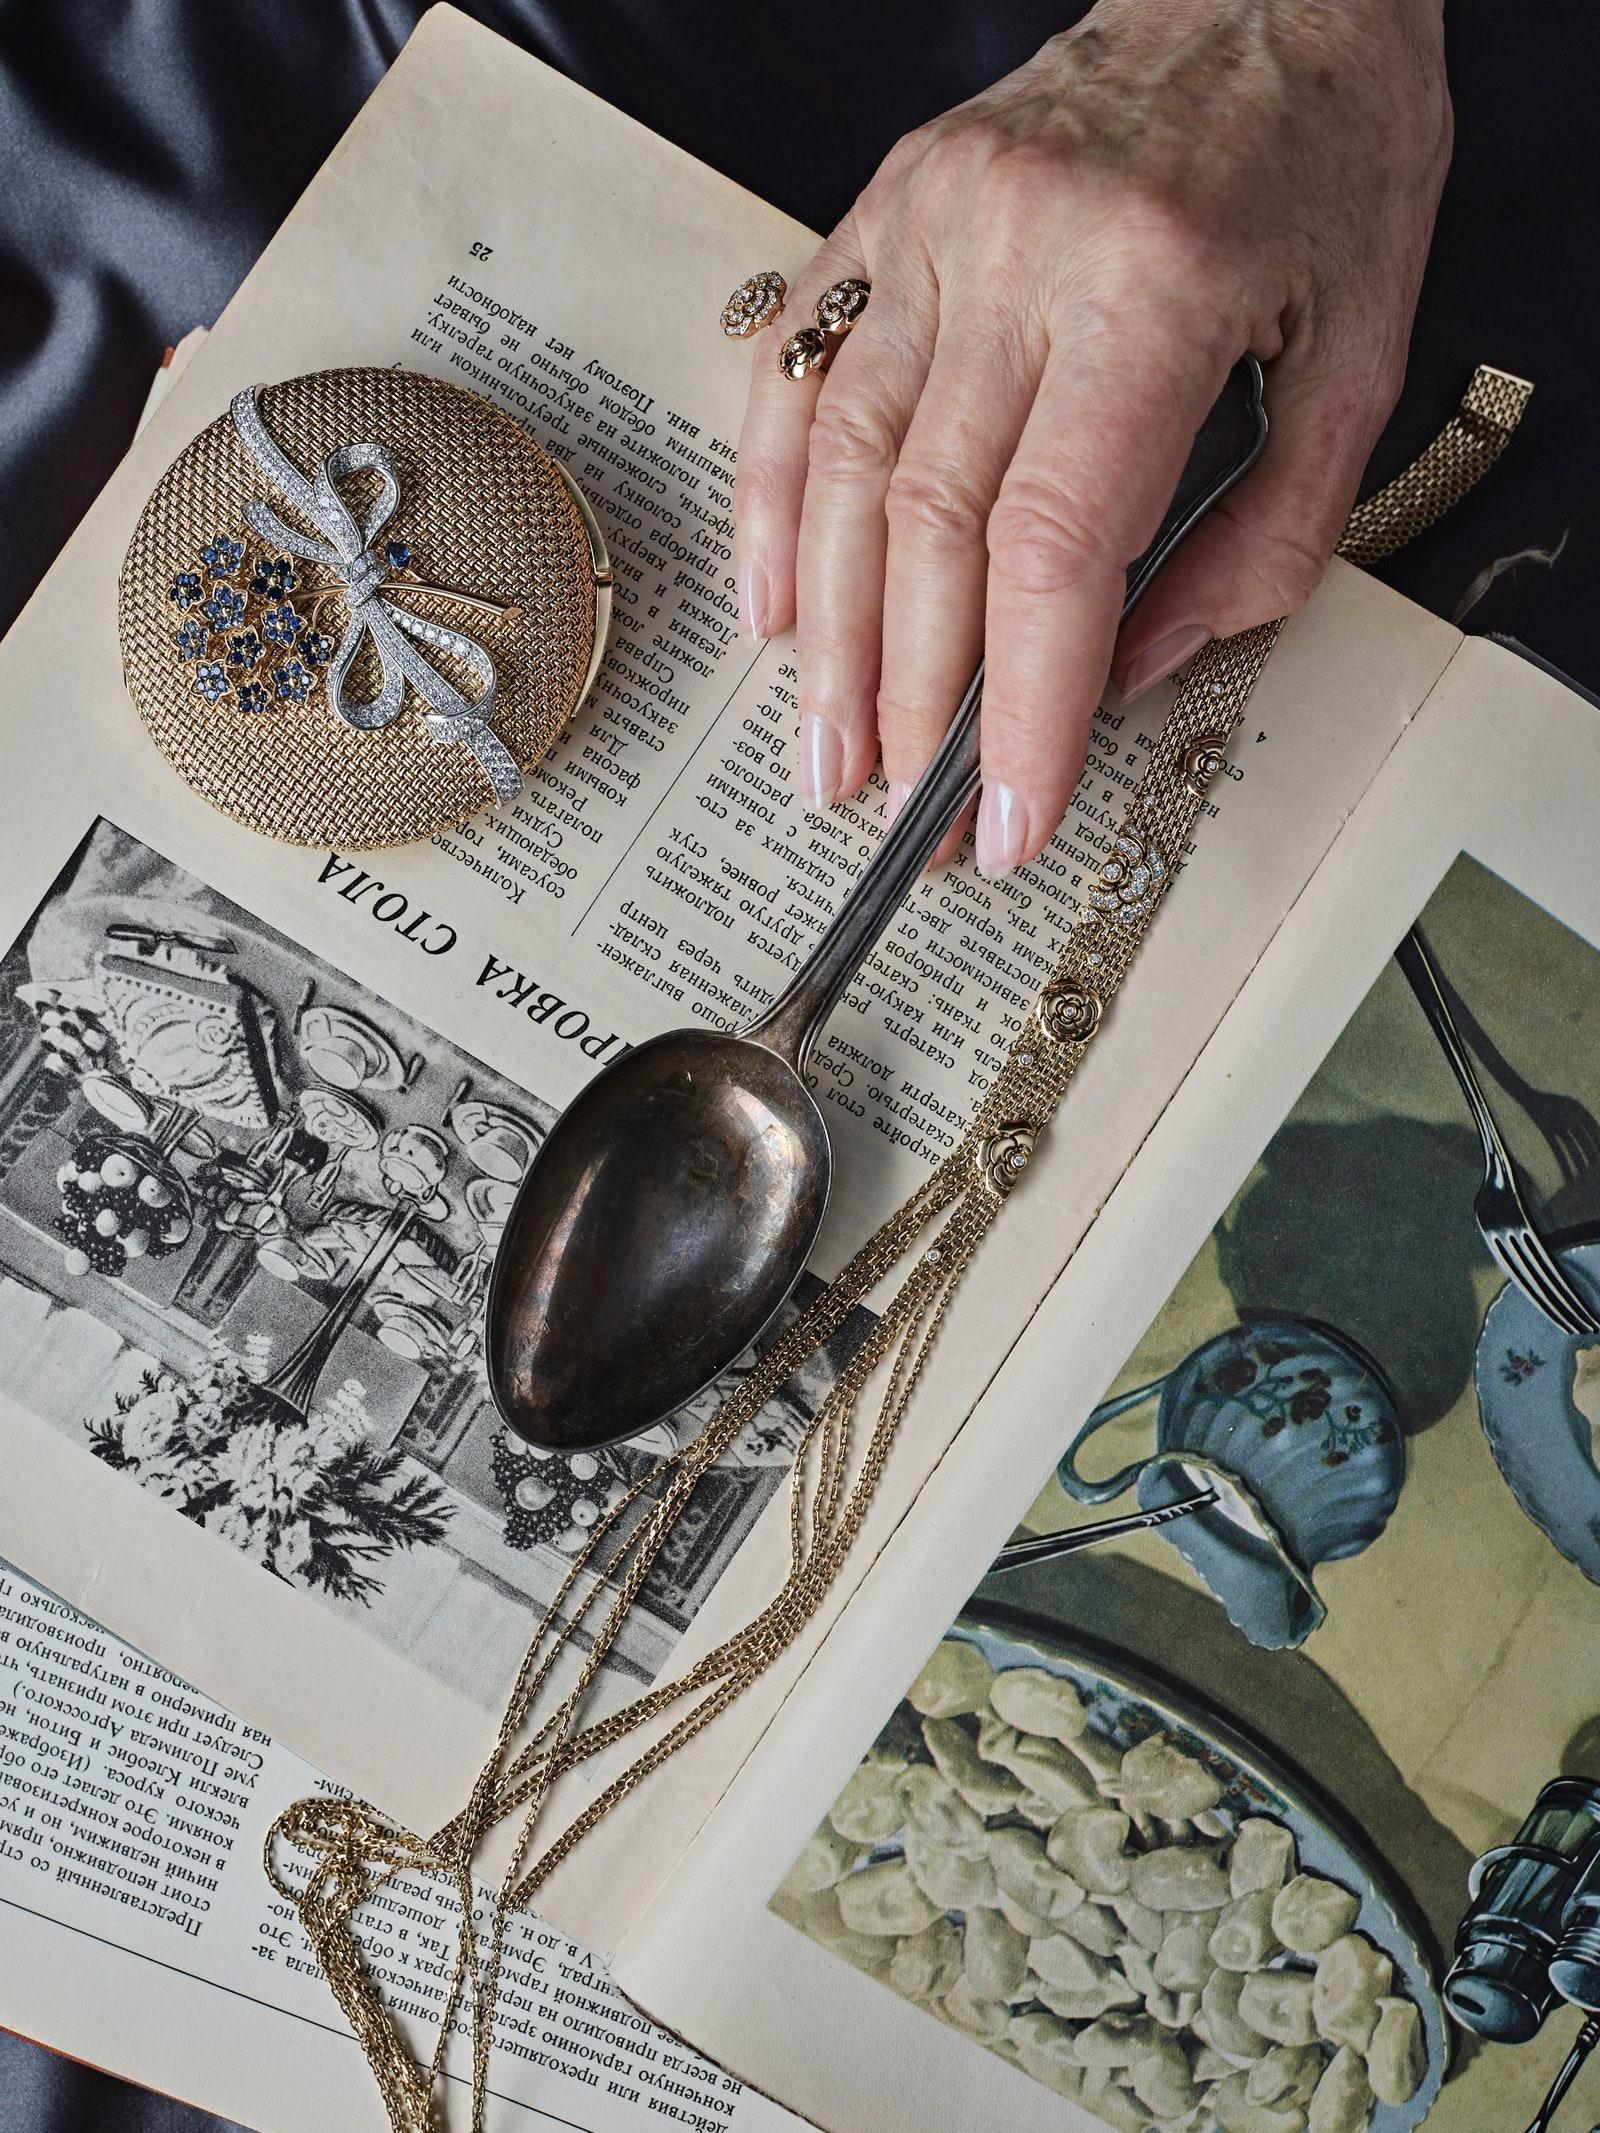 Myosotis        Van Cleef amp Arpels   Vintage Cuttlery  Home Concept  Extrait de Camlia      Impression de Camlia   ...